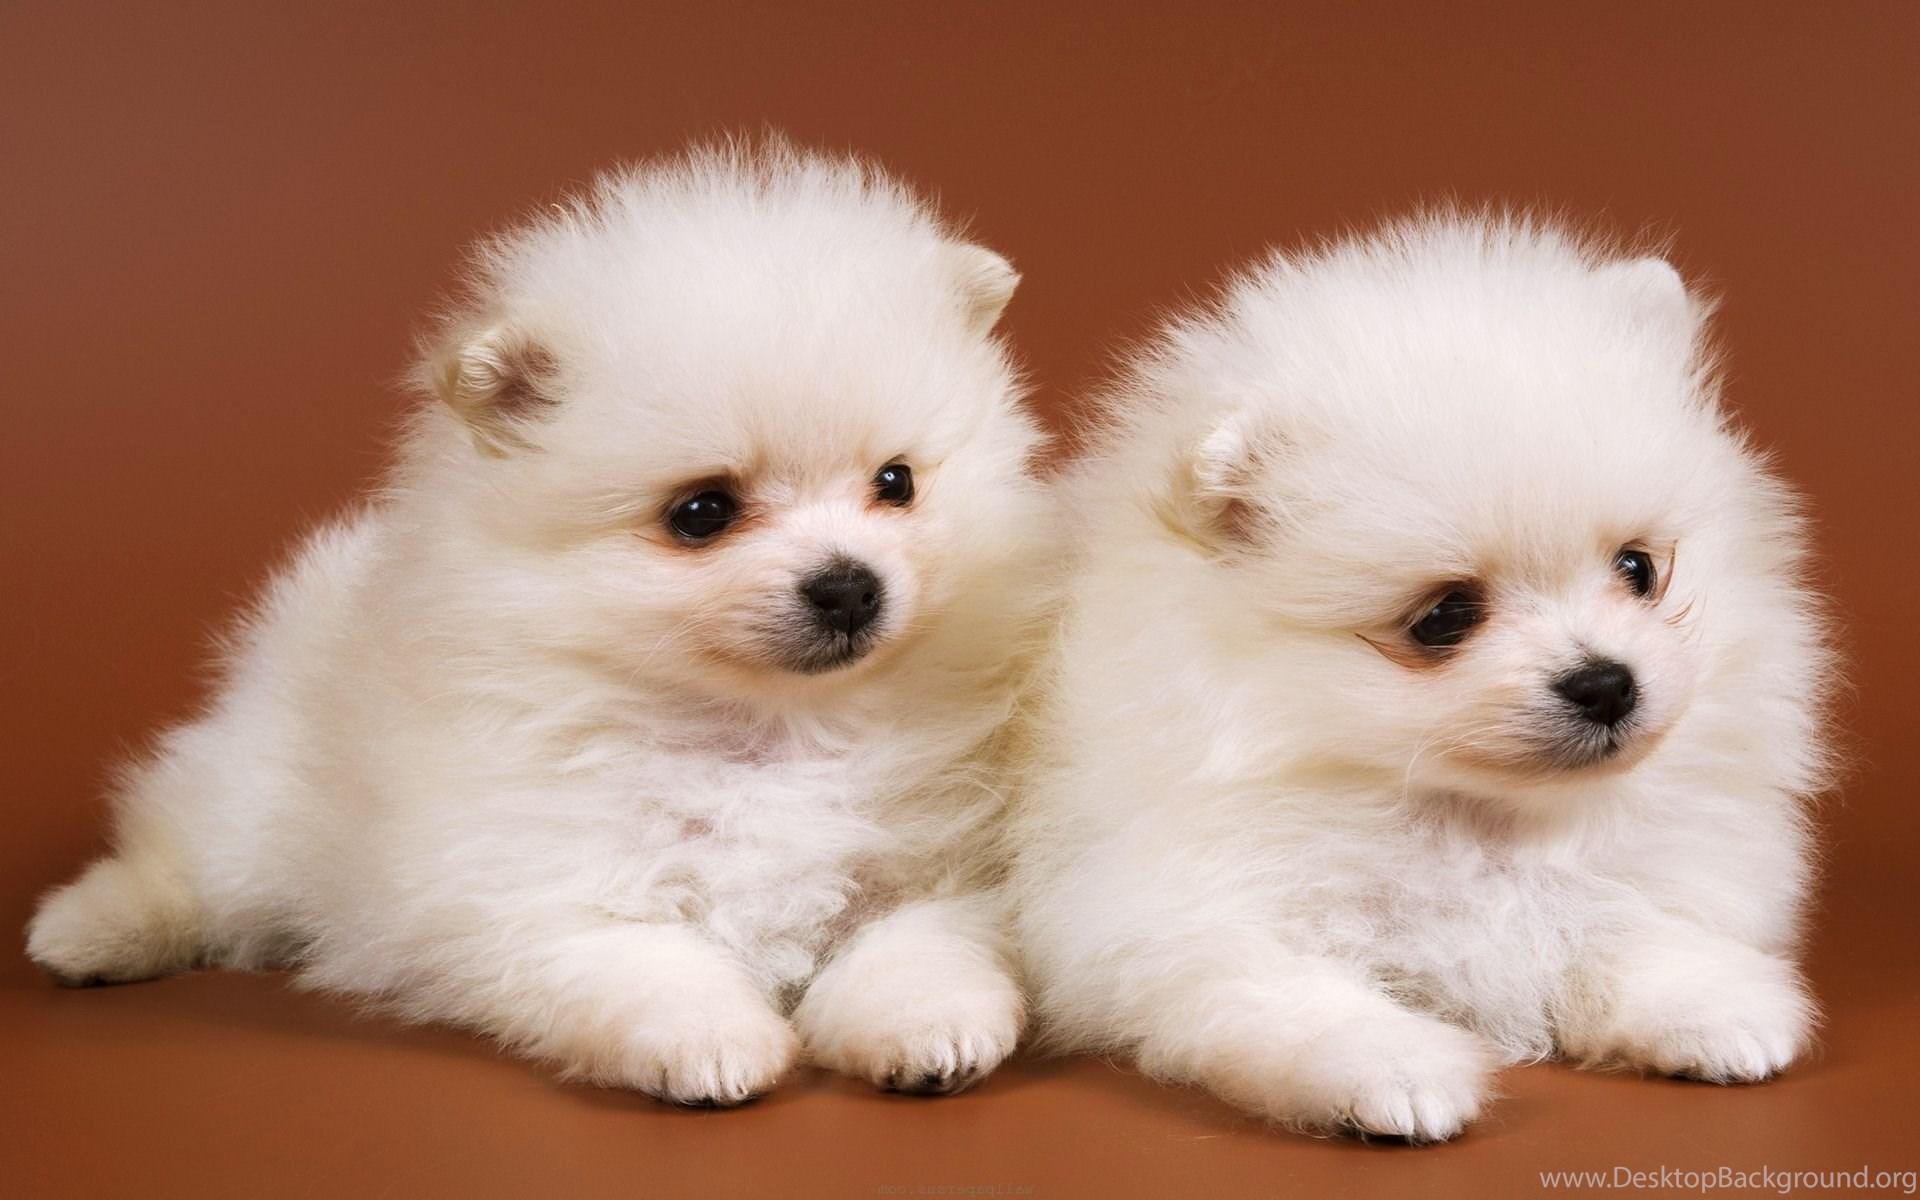 cute baby dog wallpapers for desktop desktop background